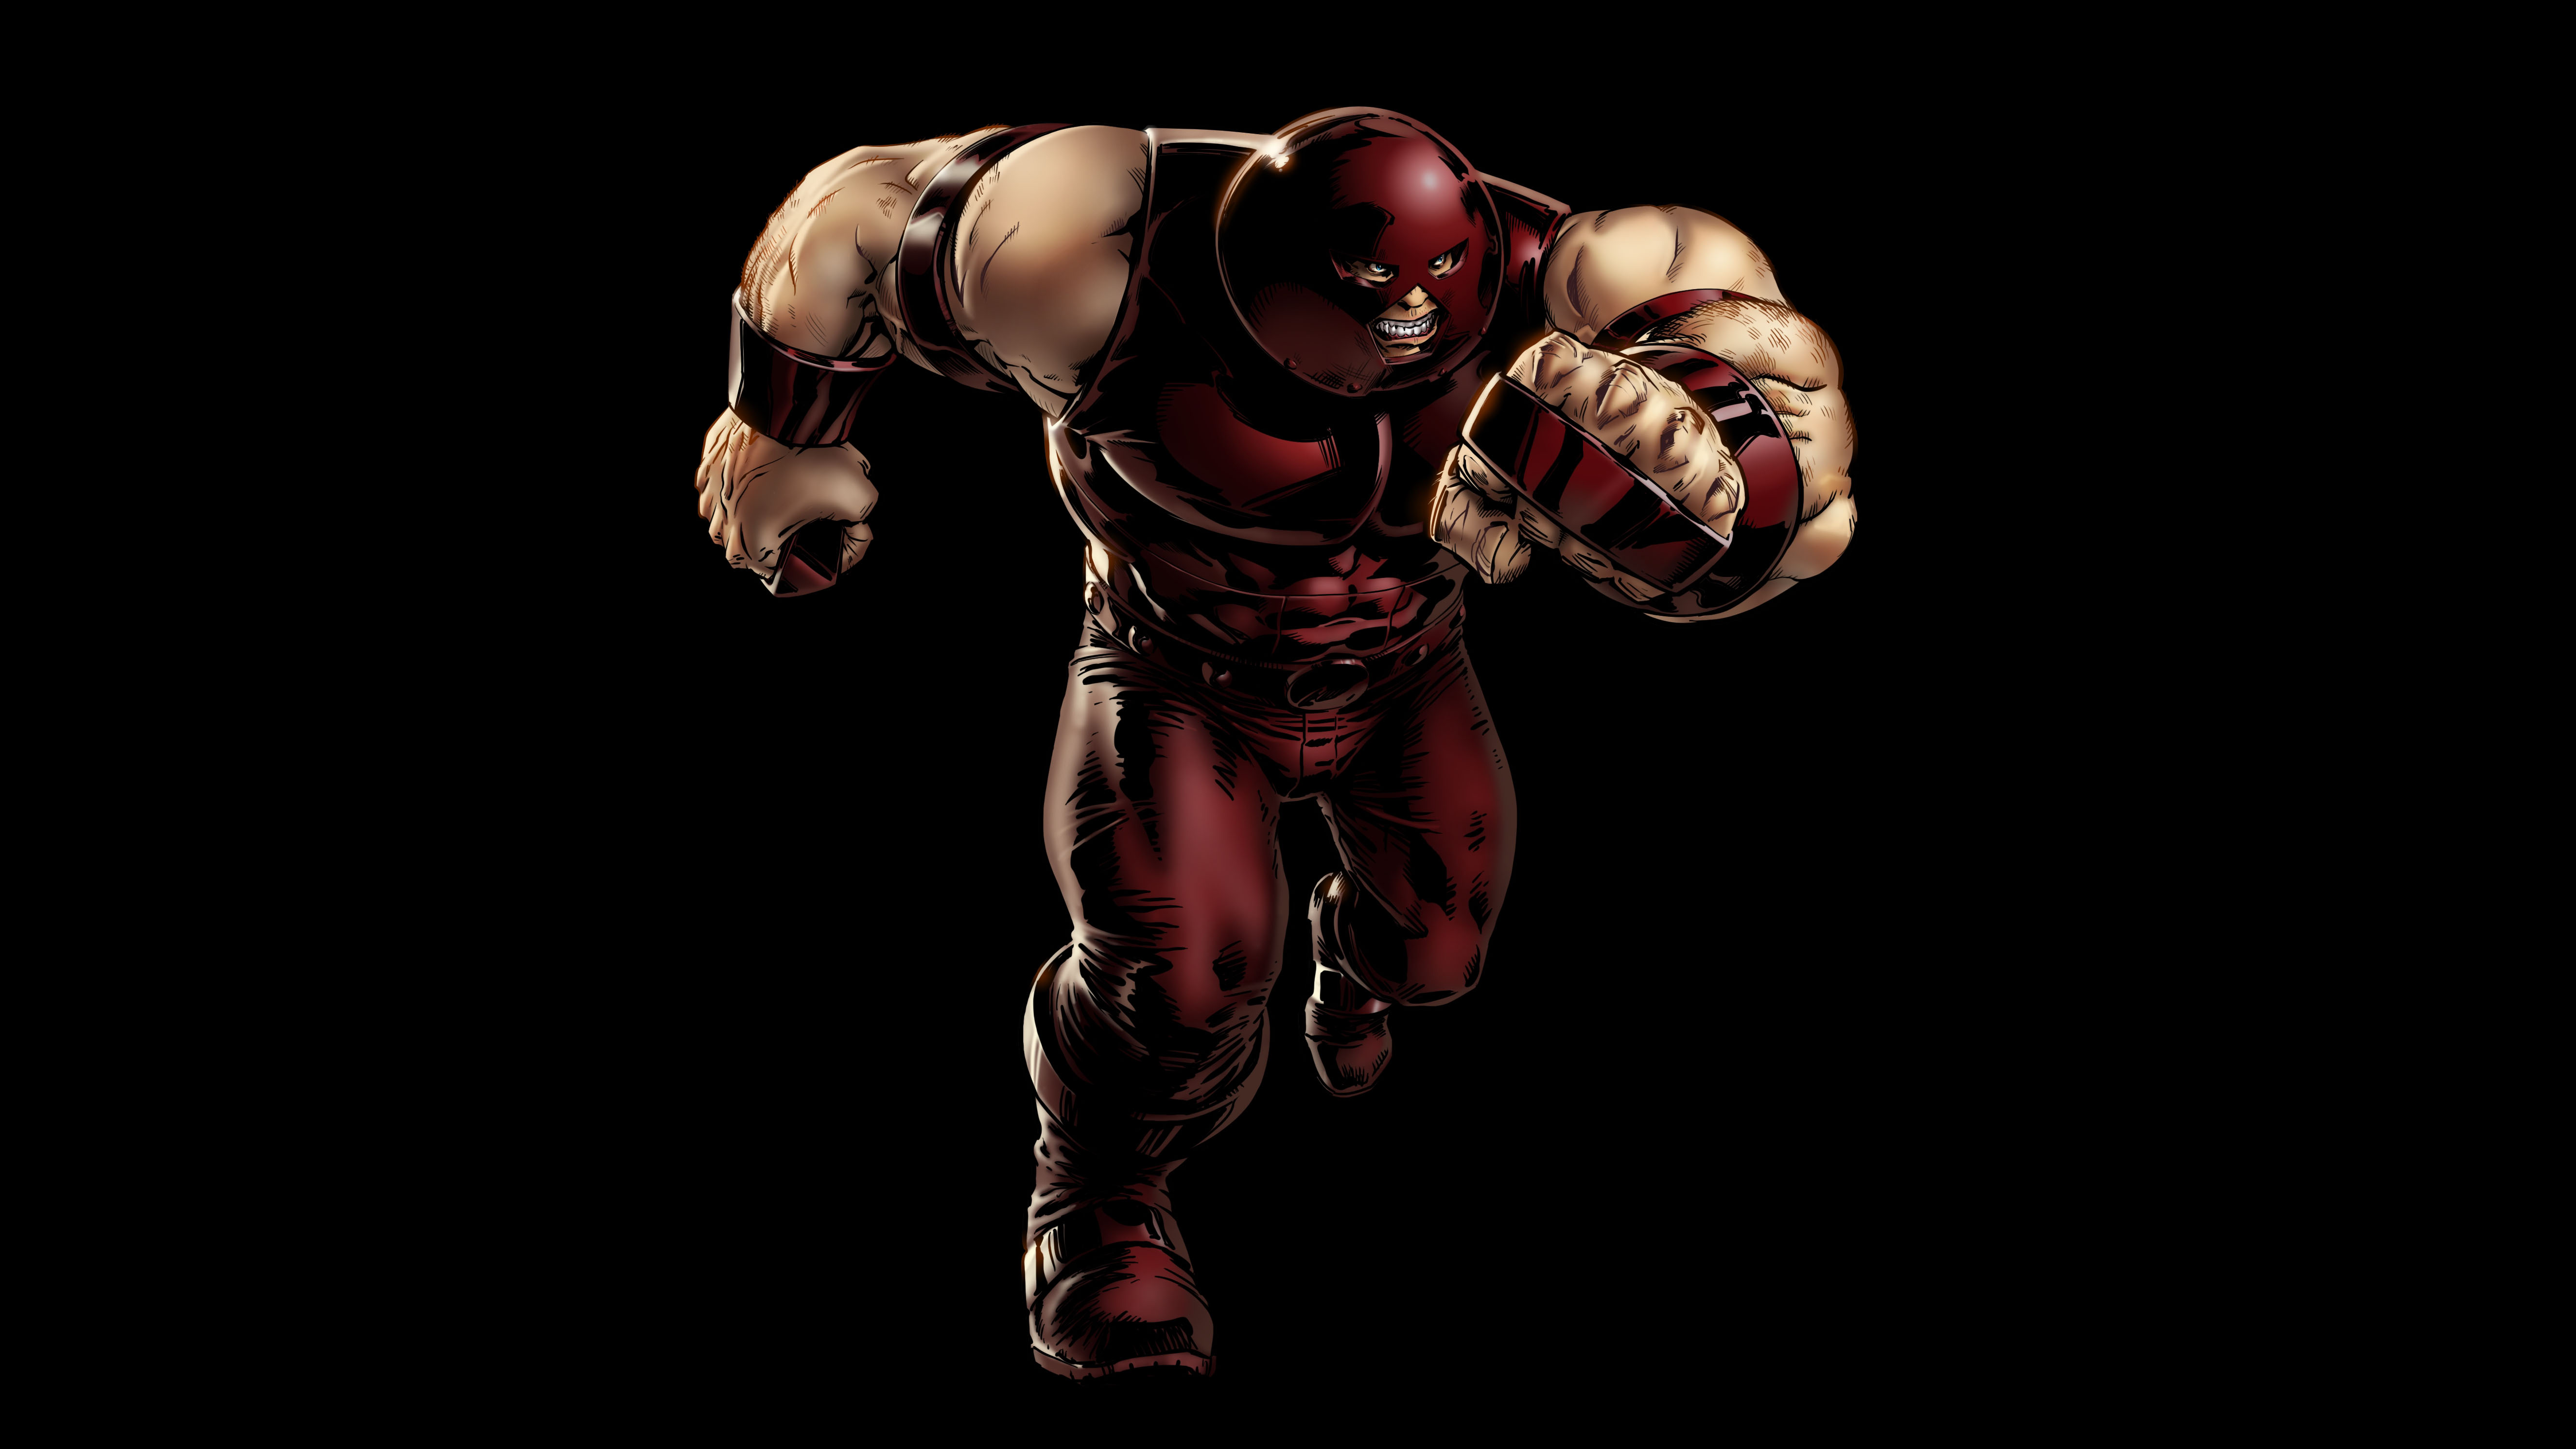 Most Inspiring Wallpaper Marvel Juggernaut - 547682  You Should Have_682886.jpg